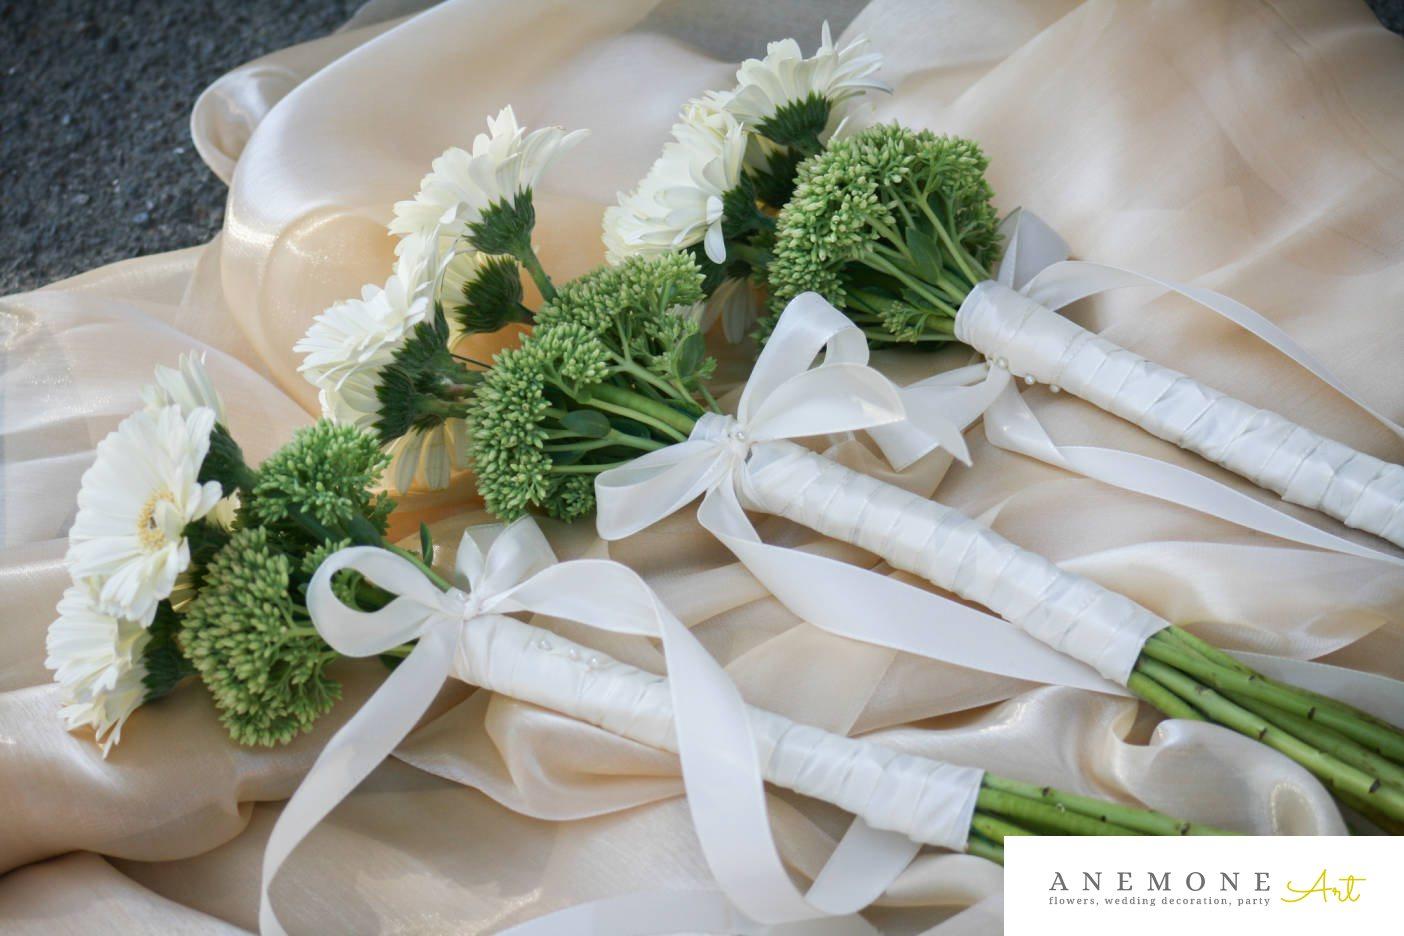 Poza, foto cu Flori de nunta alb, buchet domnisoara, mini-gerbera, sebum in Arad, Timisoara, Oradea (wedding flowers, bouquets) nunta Arad, Timisoara, Oradea